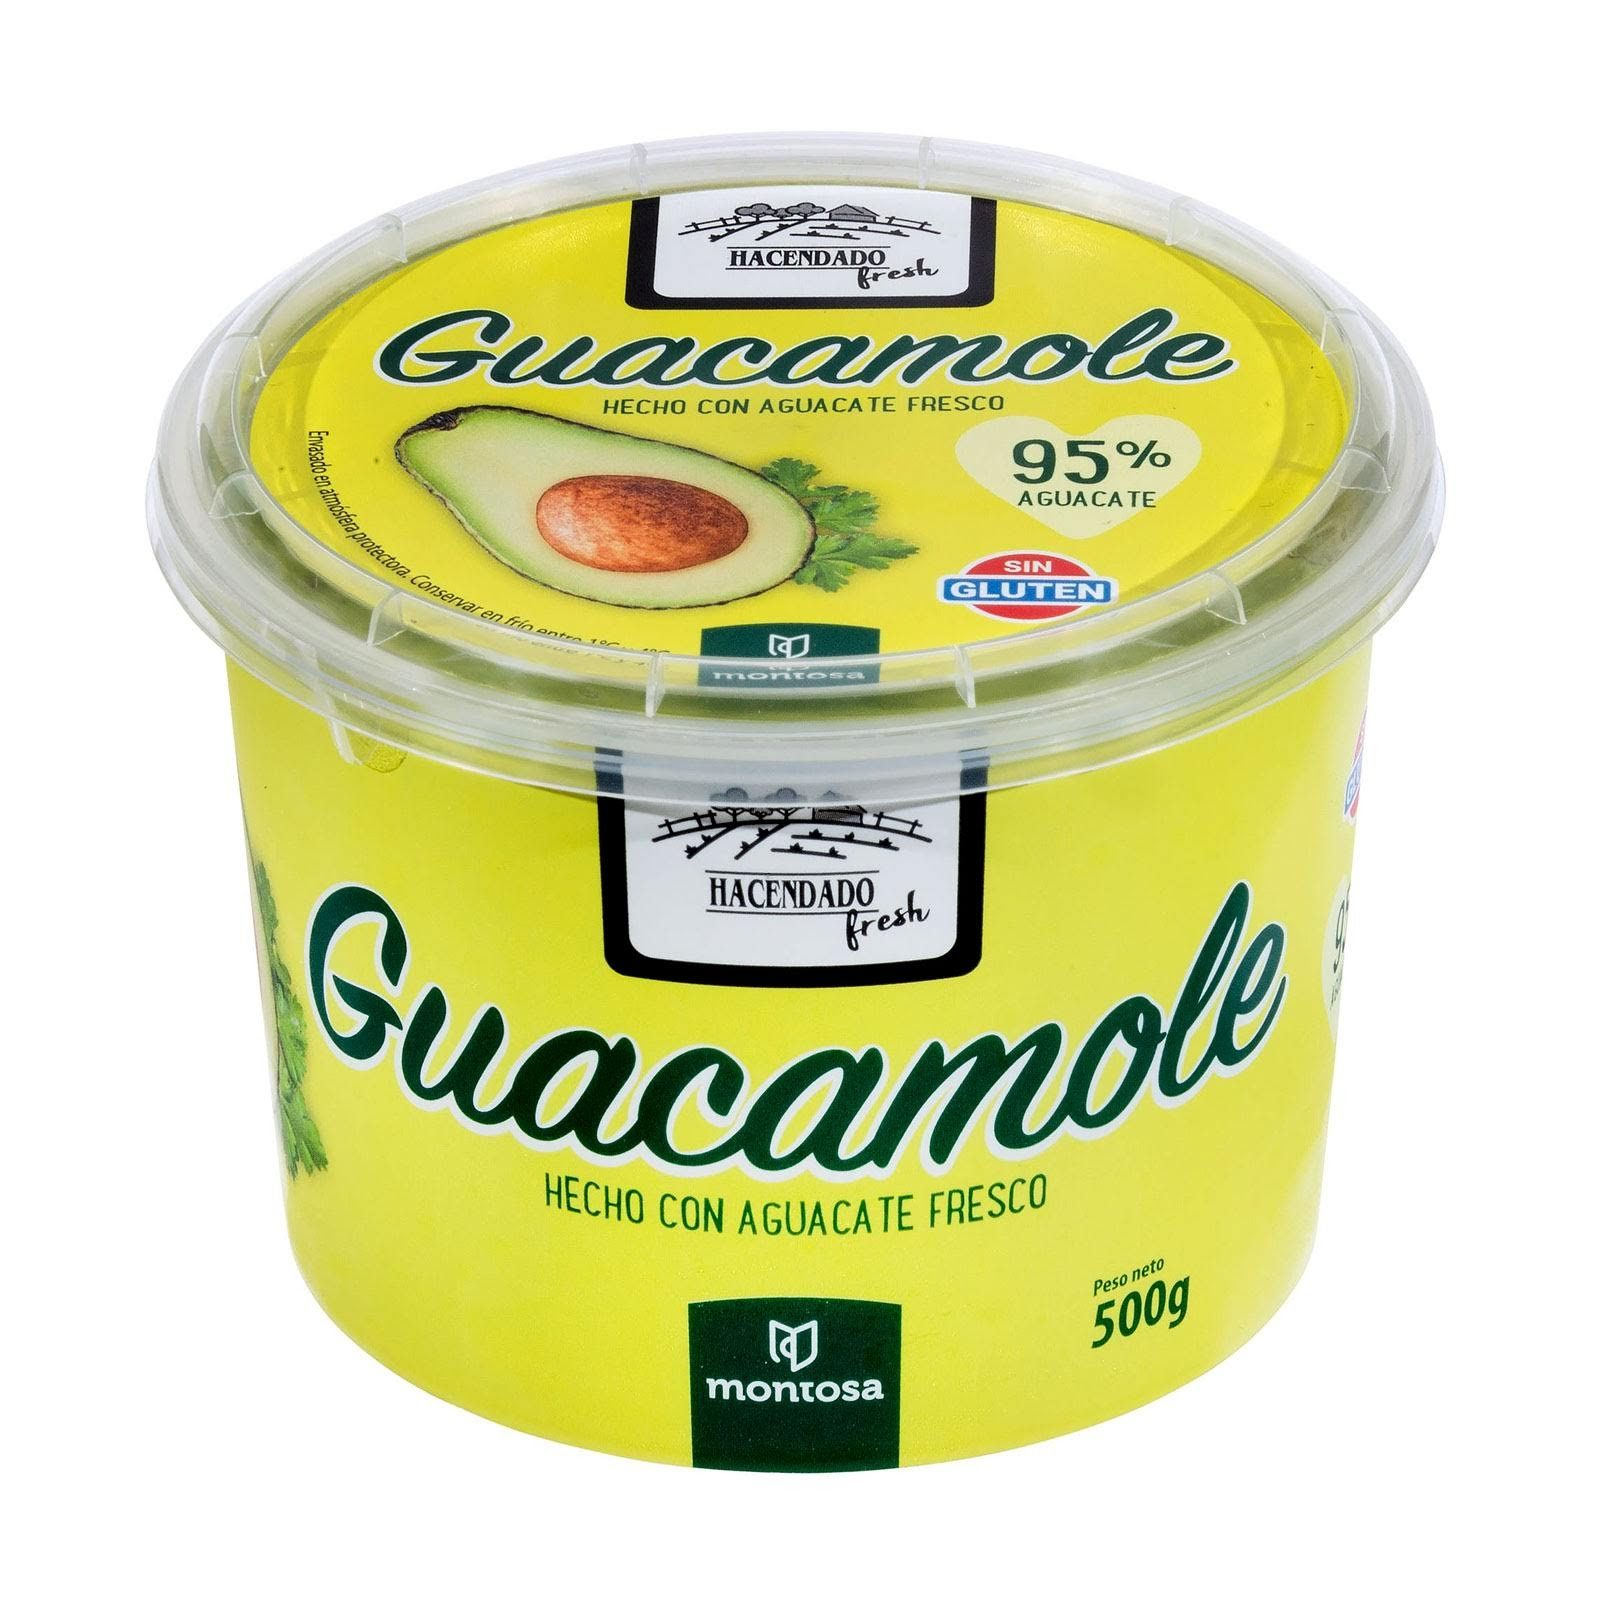 guacamole-fresco-hacendado-fresh-mercadona-1-7285132